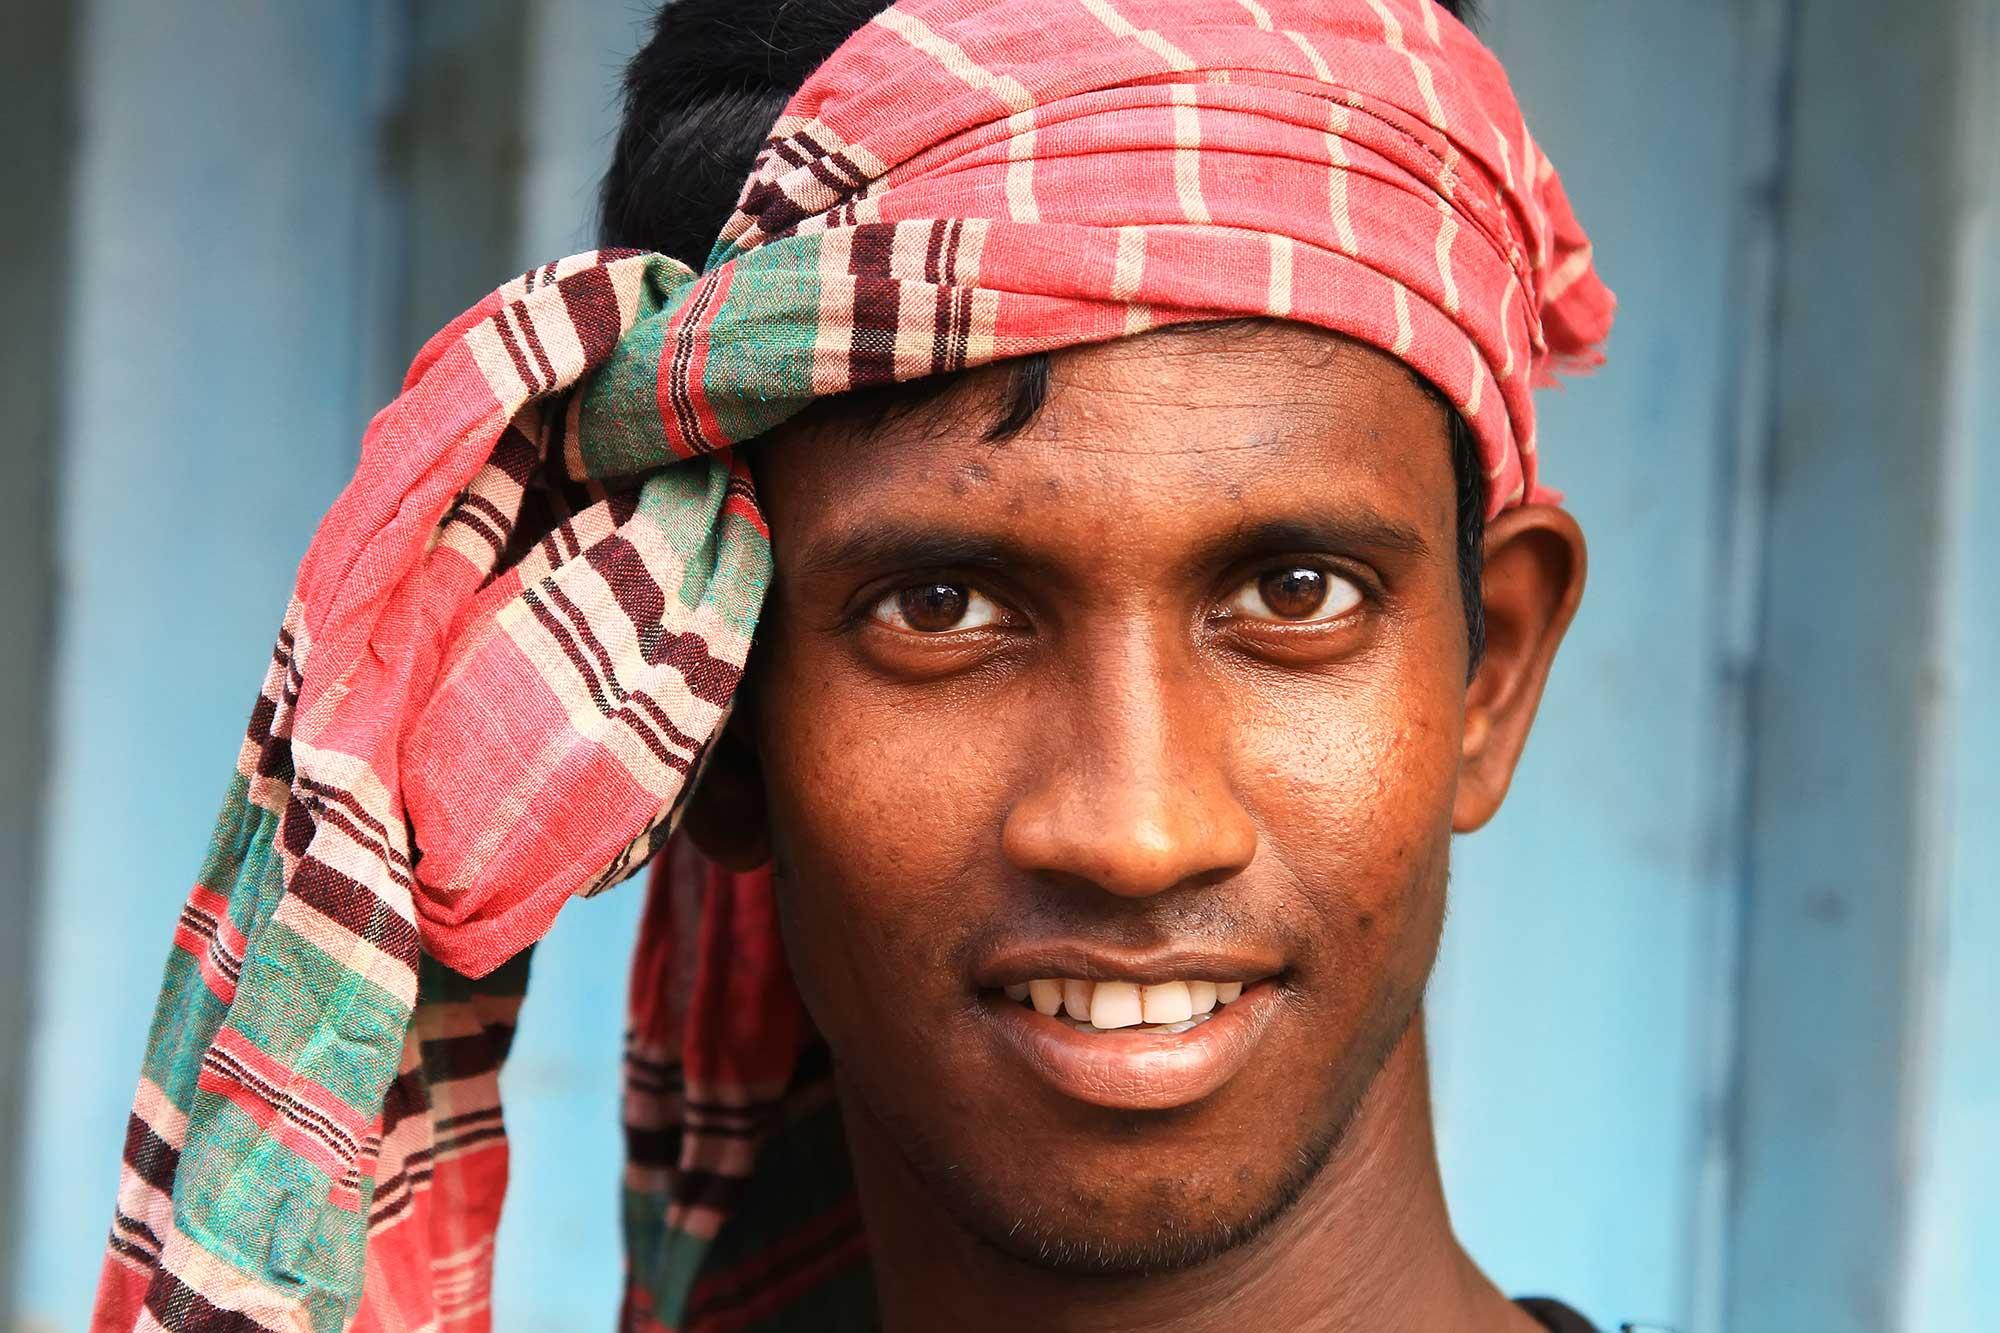 portrait-smiling-man-kuakata-bangladesh